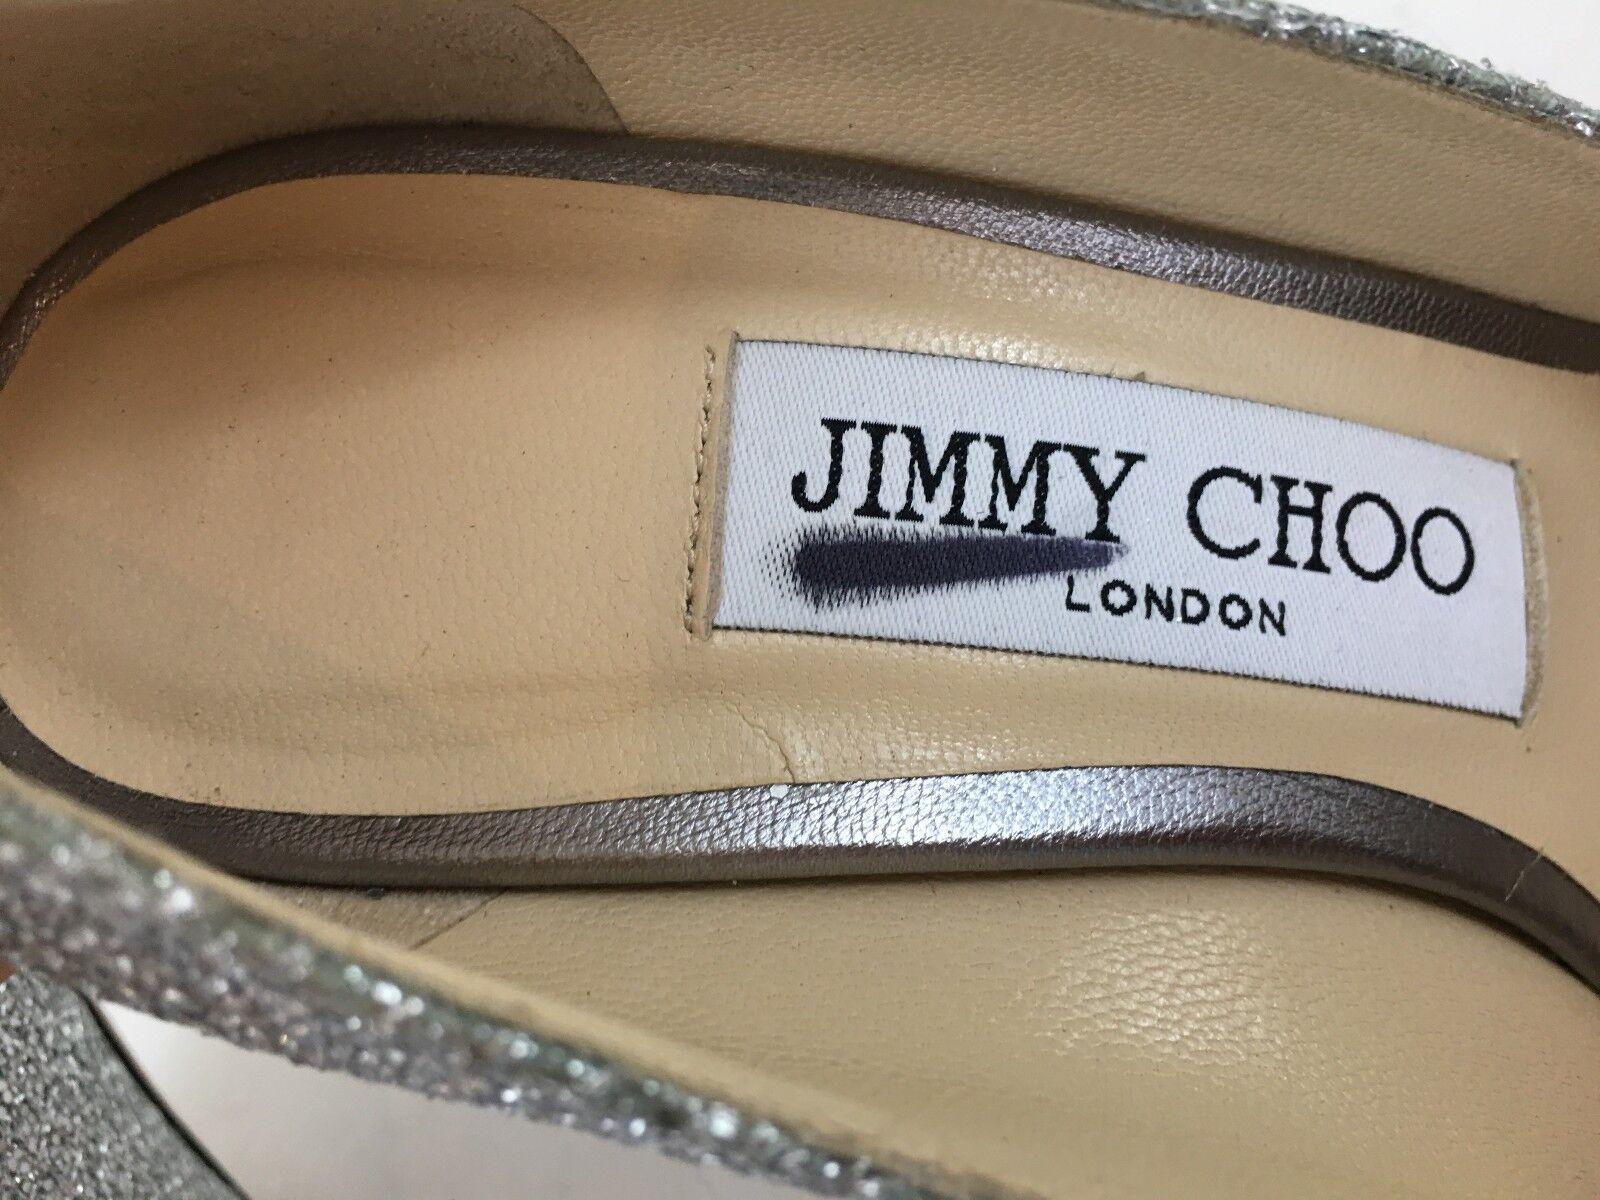 NEW NEW NEW JIMMY CHOO ROMY Silber GLITTER LEATHER HEEL PUMP Größe 34.5 US 4.5  595 a61feb